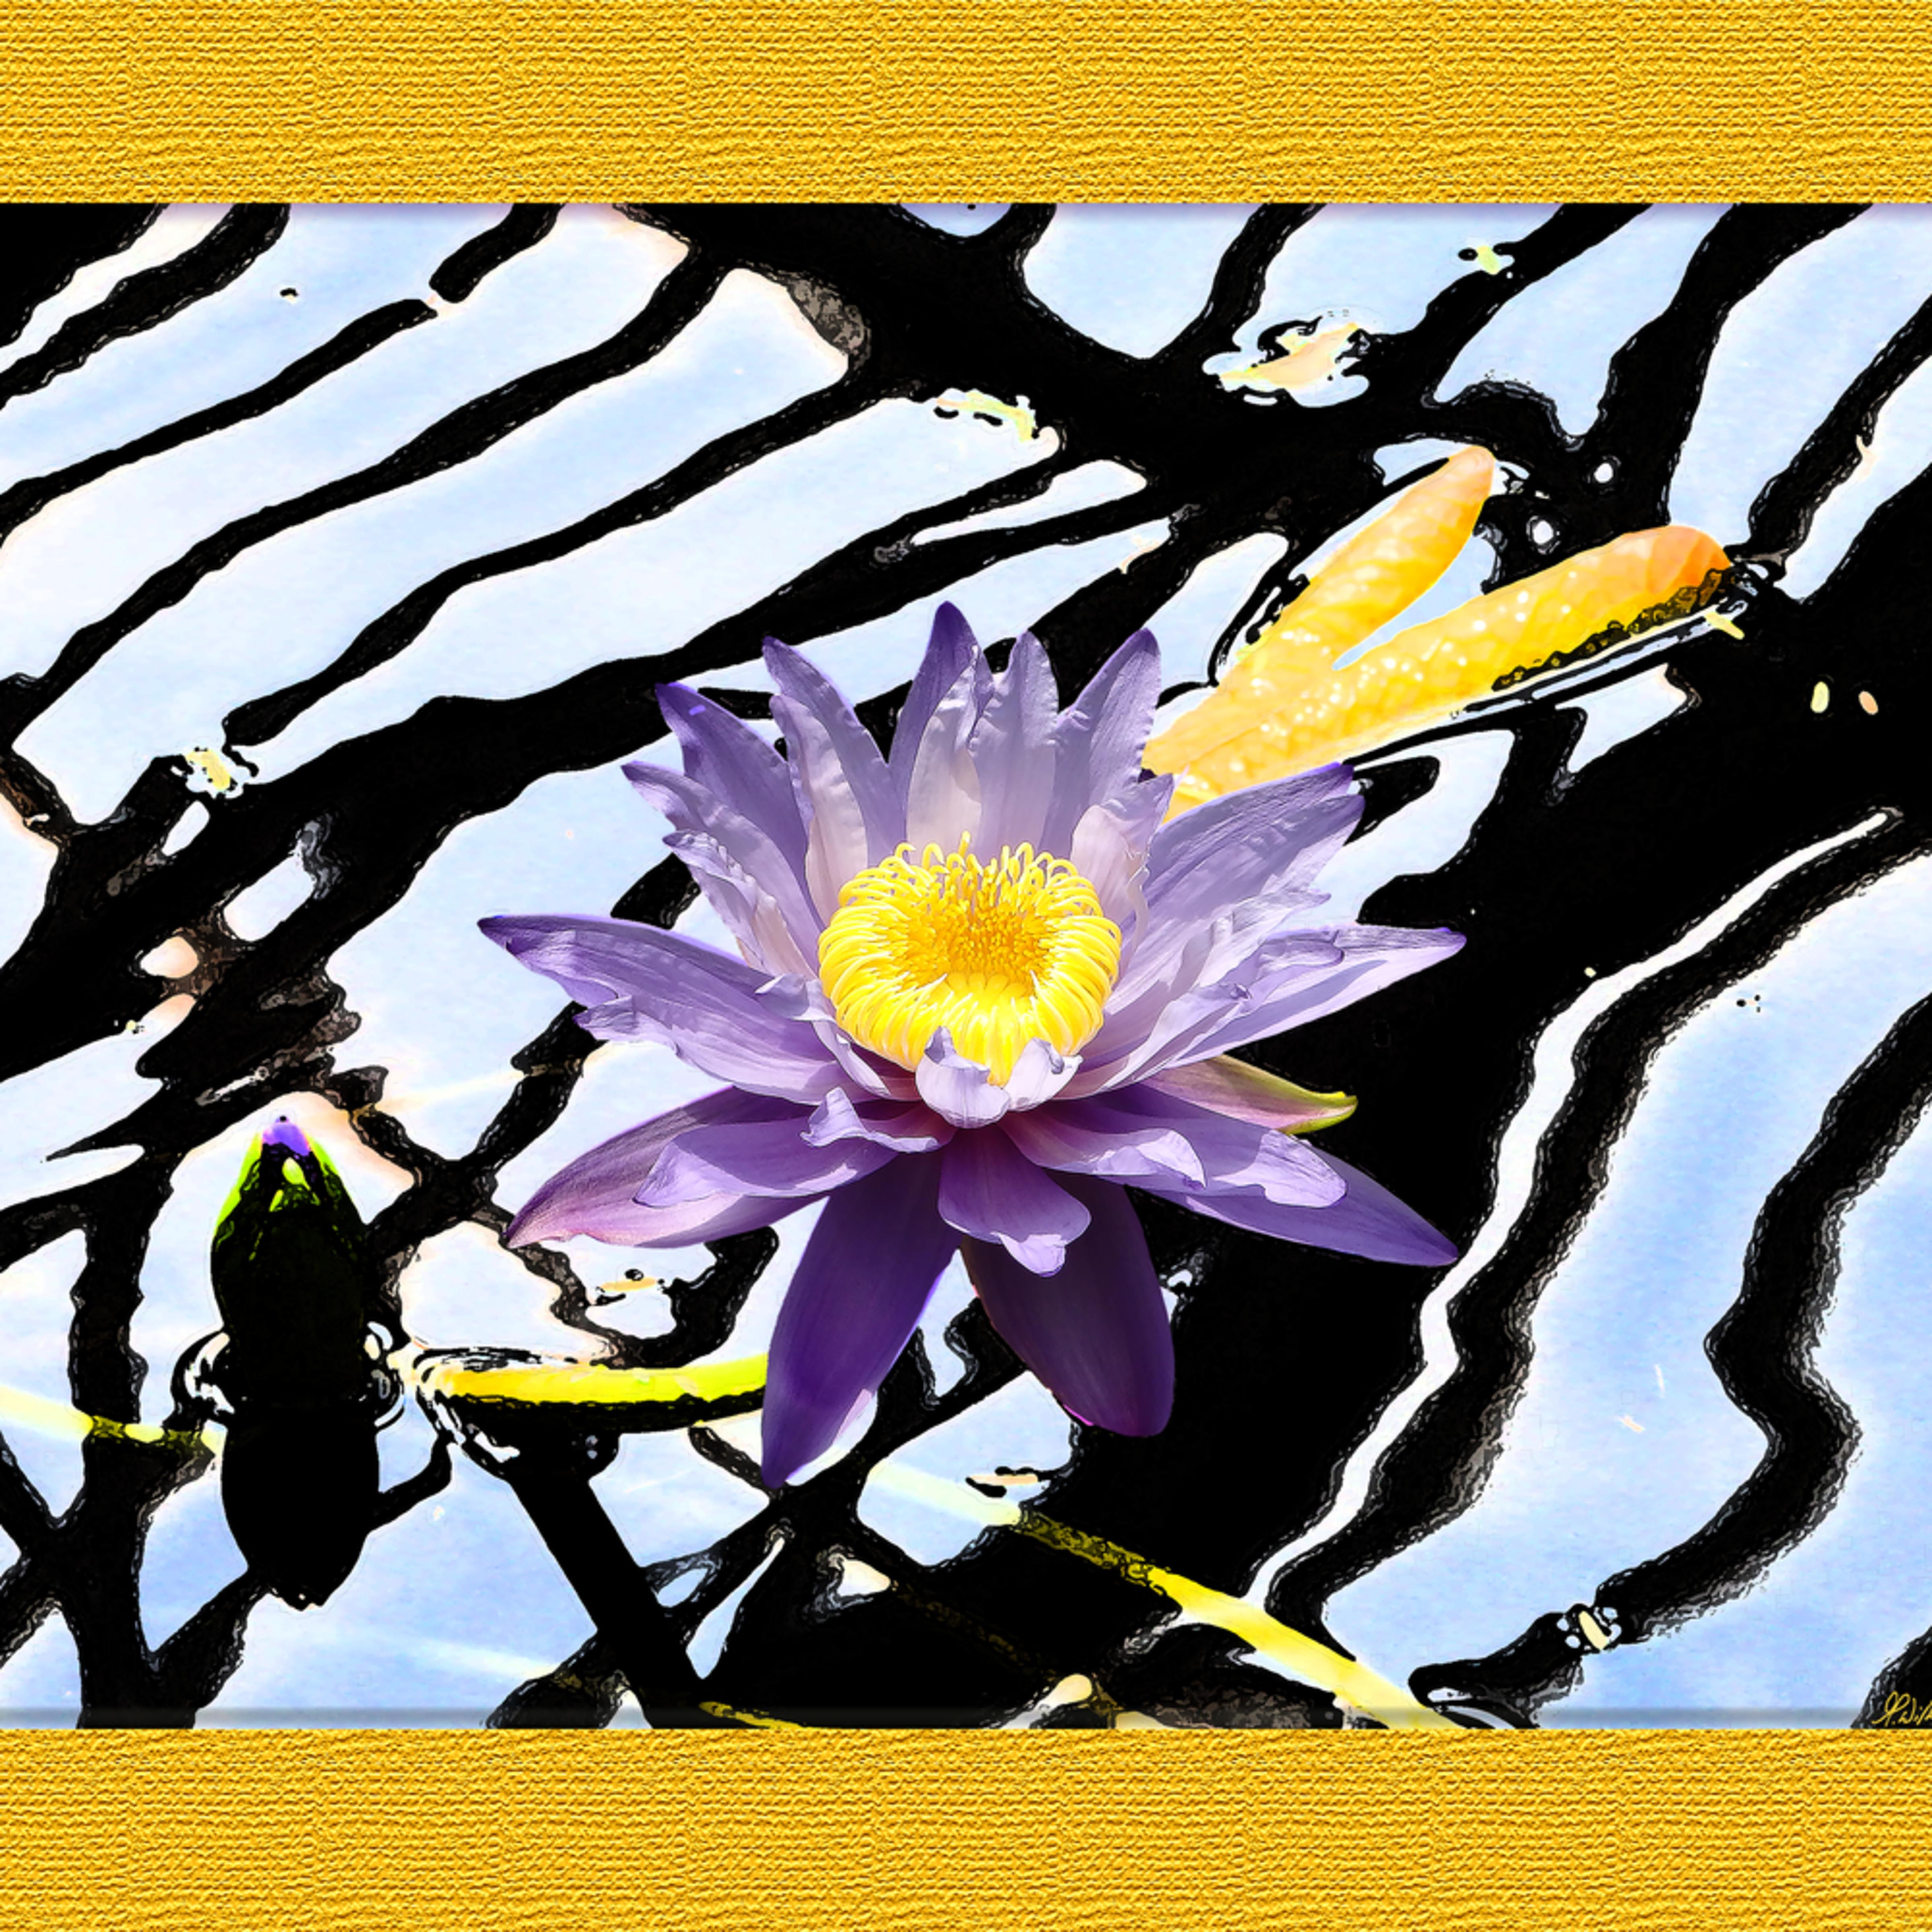 Purplewaterlily bhci51